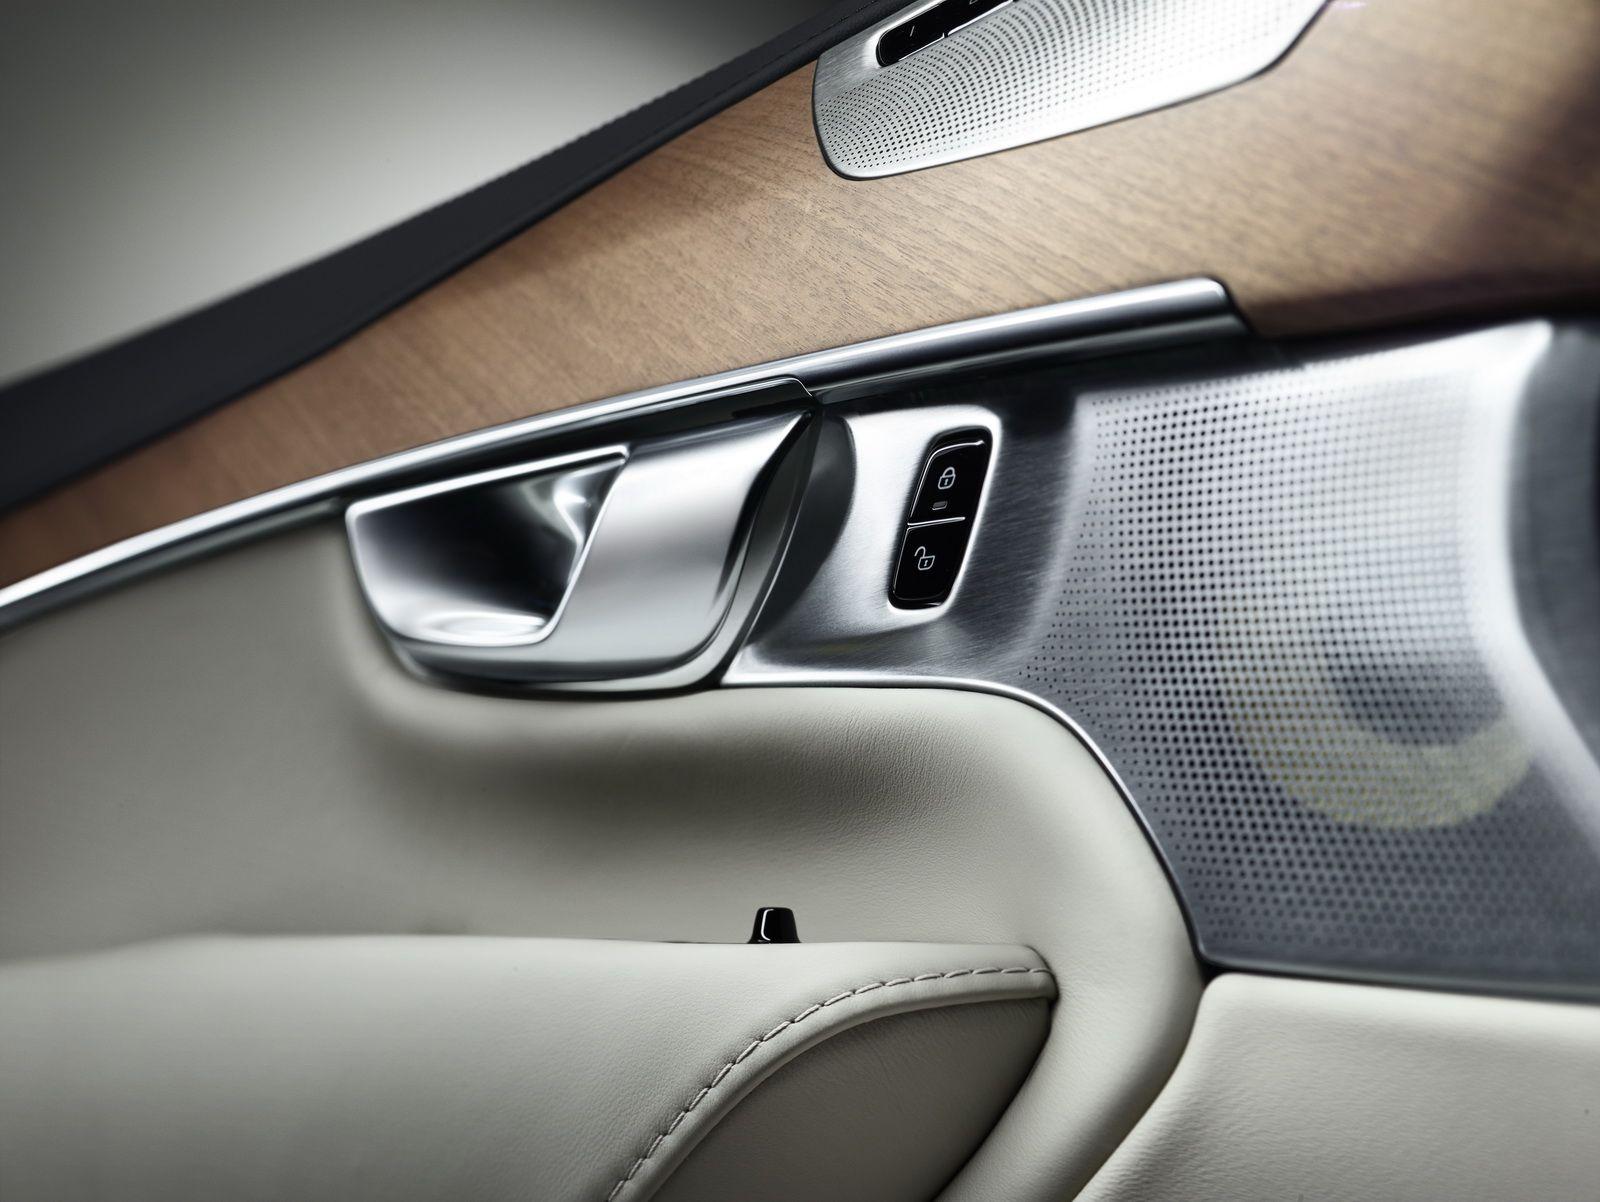 volvo xc90 volvo 850 auto interieur ontwerp interieurschets auto interieurs pick uptrucks